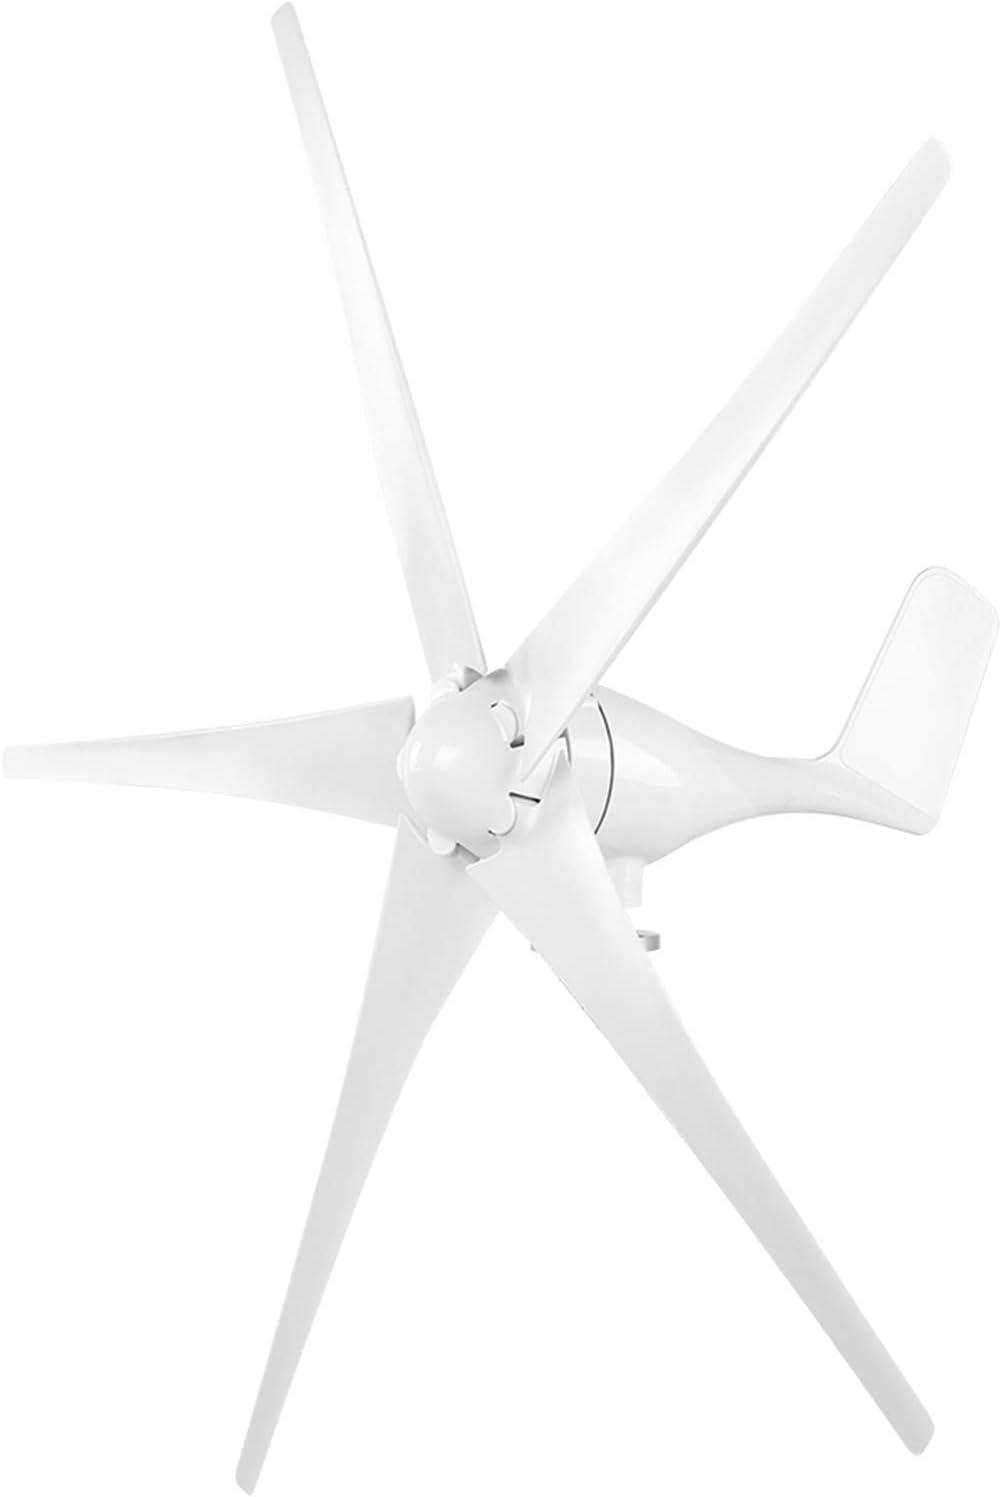 Generador de turbina eólica, generador de molino de viento 1600W Empresas de turbina eólica 5 palas Controlador de viento Kit de generador de turbina para barcos, terrazas, cabañas(White 24V)